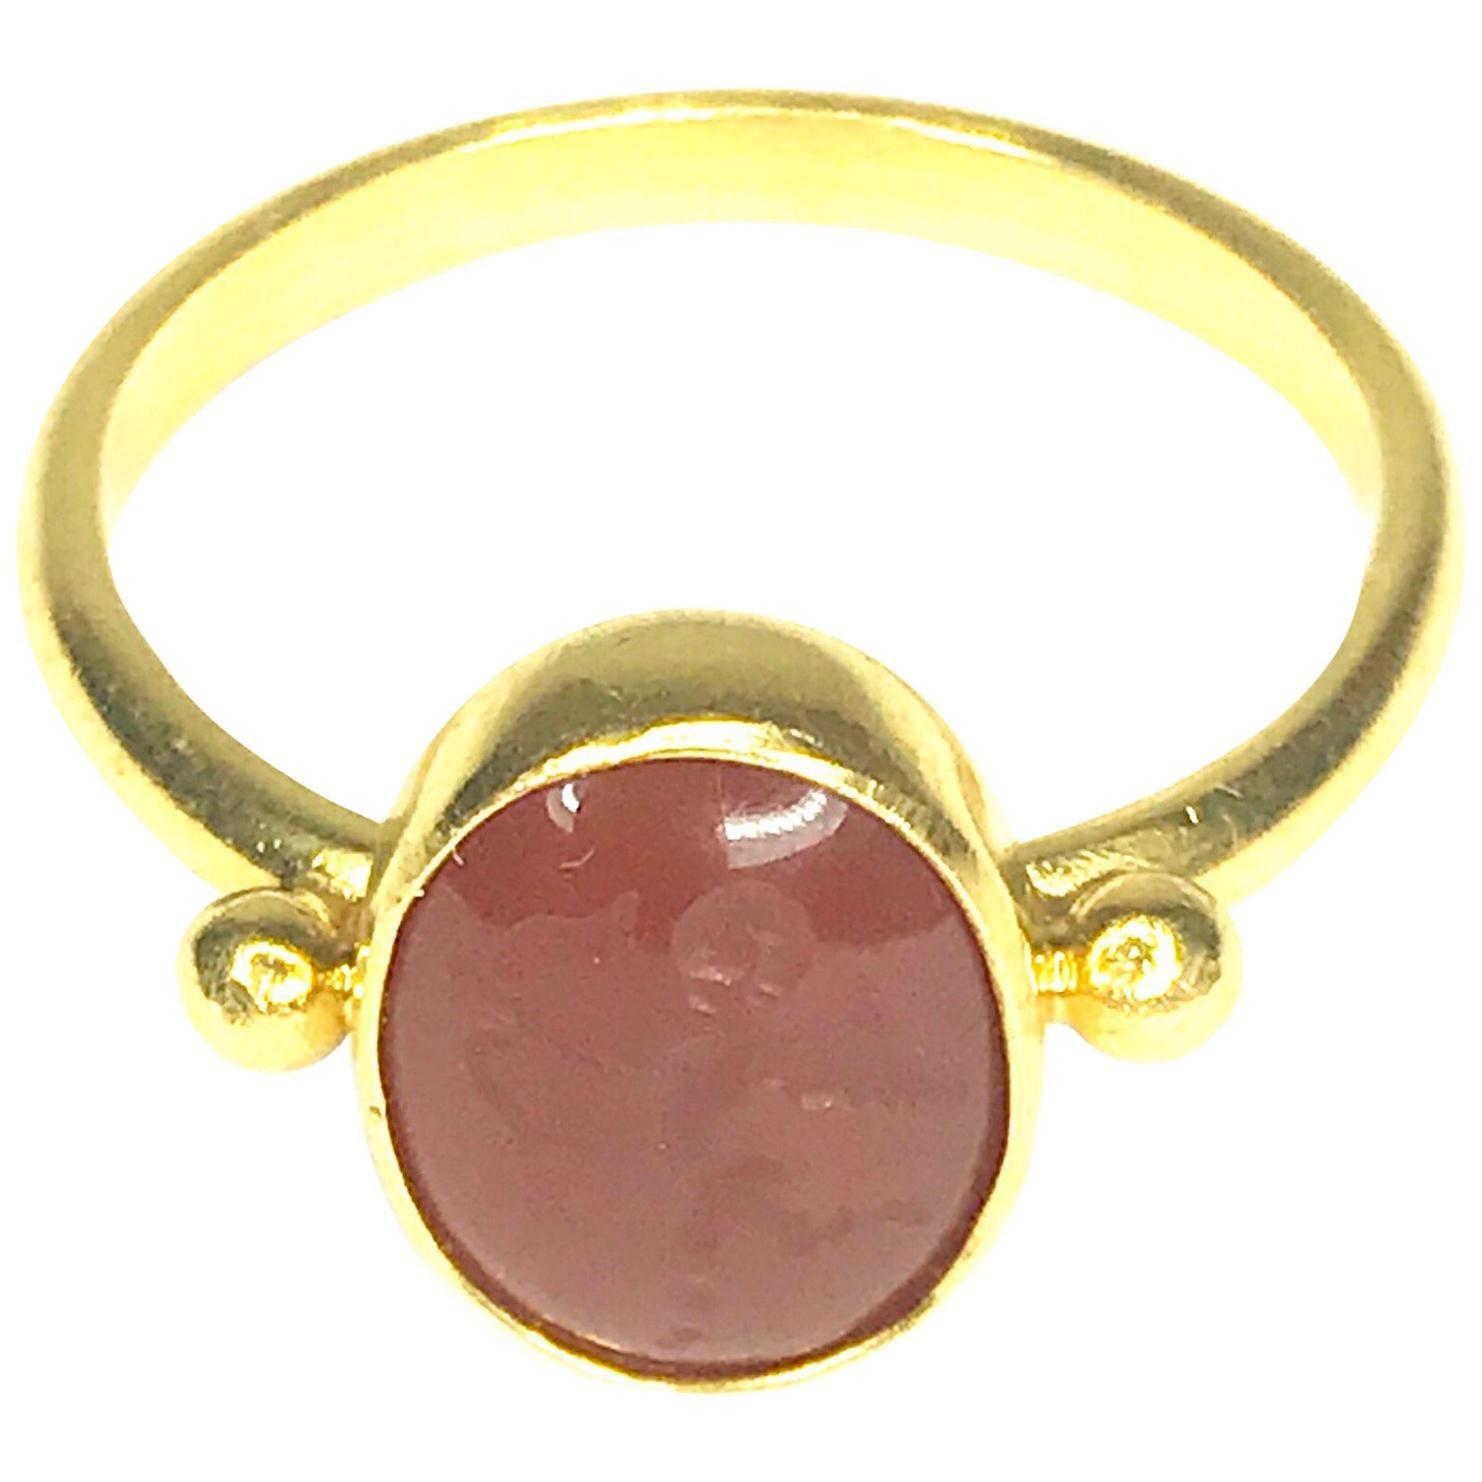 Gemolithos Modern Carnelian Intaglio 22 Karat Gold Ring with Eros for Every Day